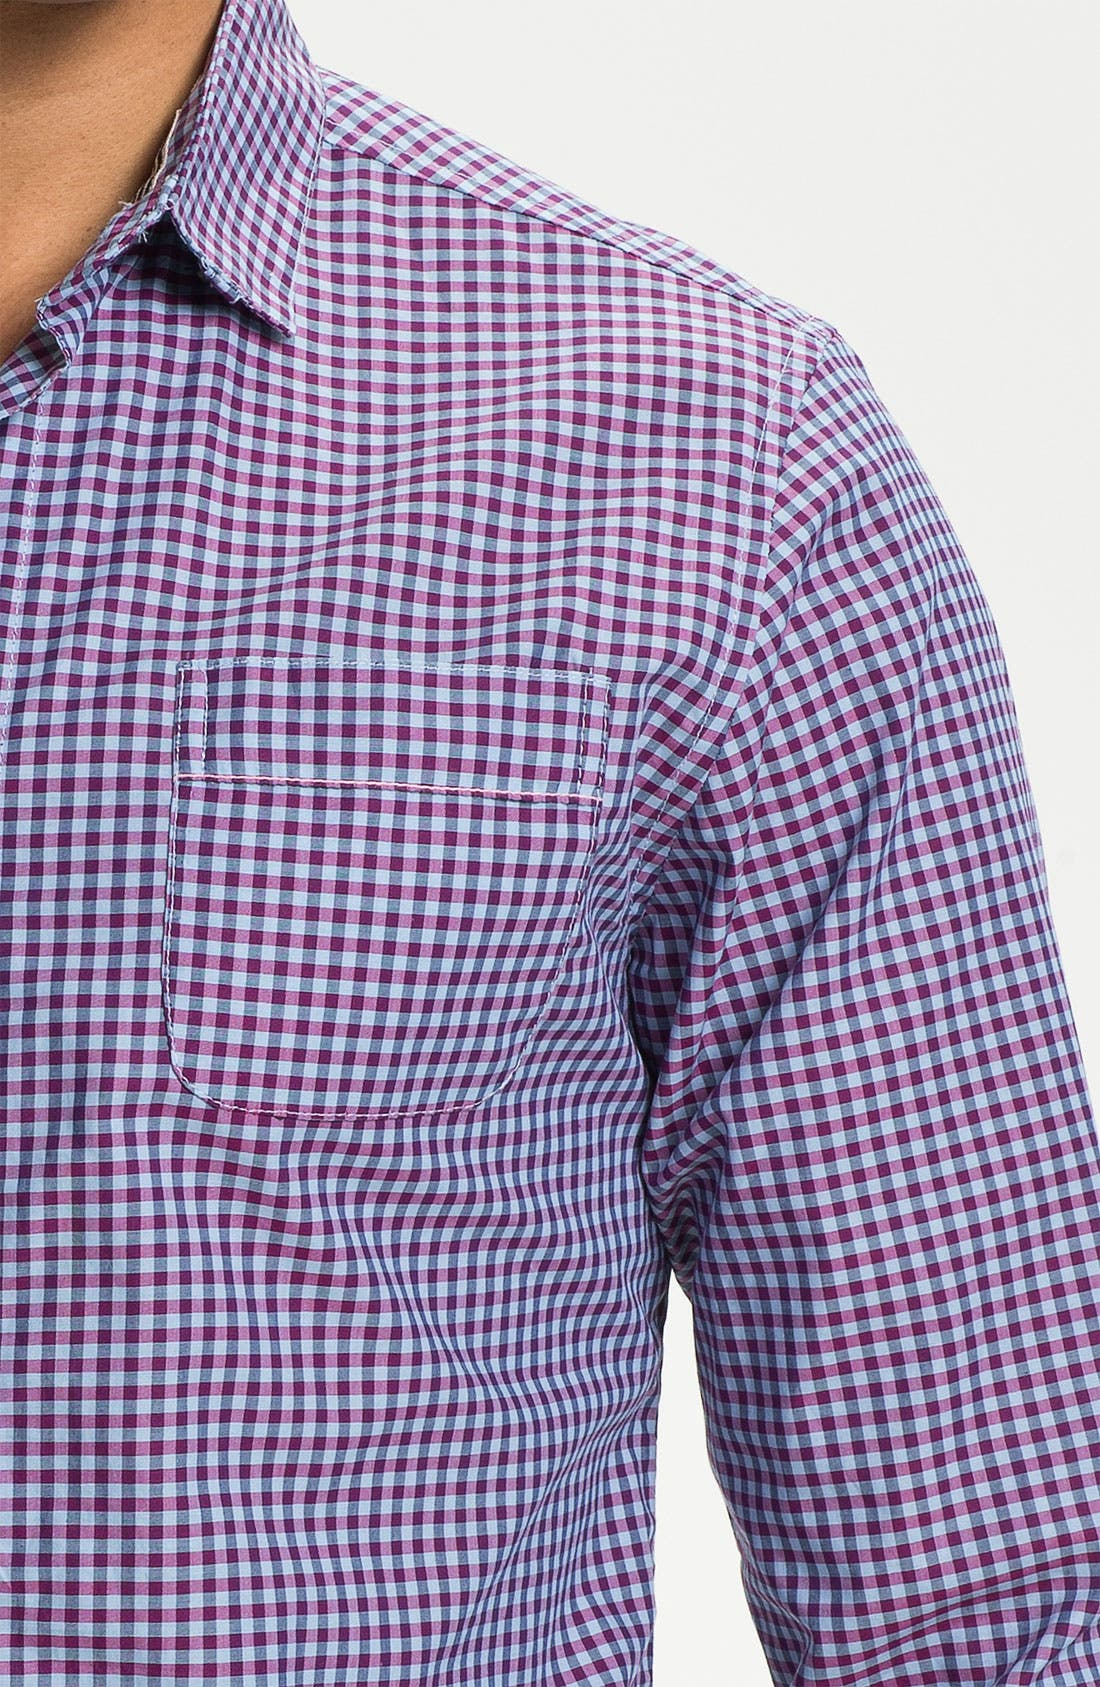 Alternate Image 3  - Descendant of Thieves Gingham Shirt